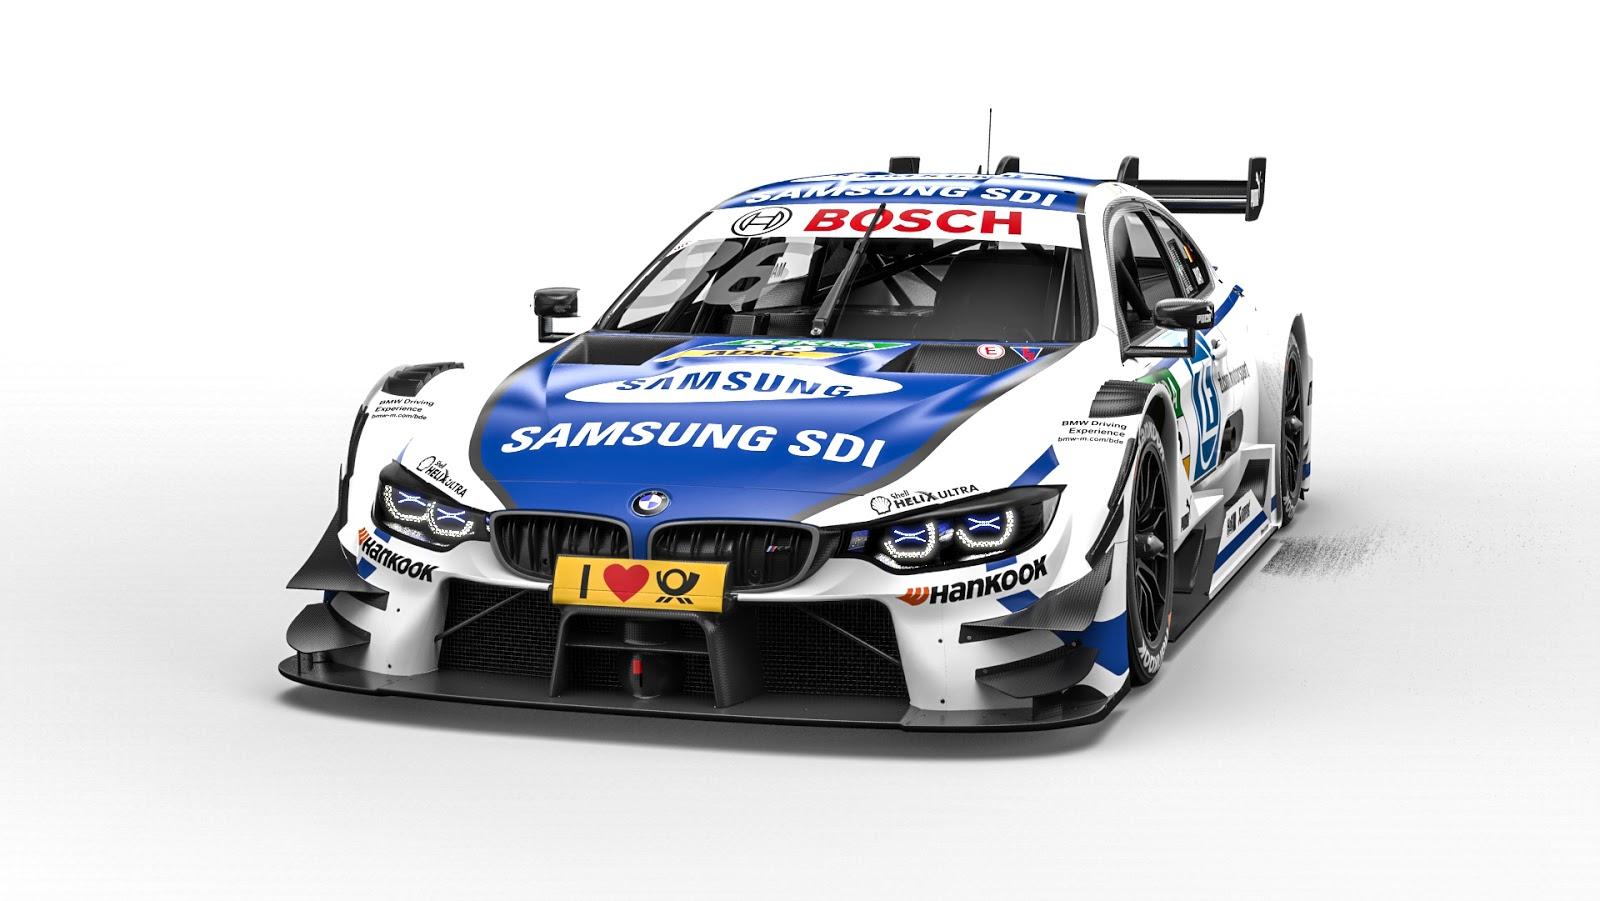 P90255229 highRes 21st april 2017 muni Η BMW Motorsport ξεκινά τη νέα σεζόν με ισχυρούς εταίρους Akrapovič, BMW, Bmw Bank, BMW M4 DTM, BMW M6, BMW M6 GT3, BMW Motorsport, DTM, Red Bull, Samsung, Shell, αγωνες